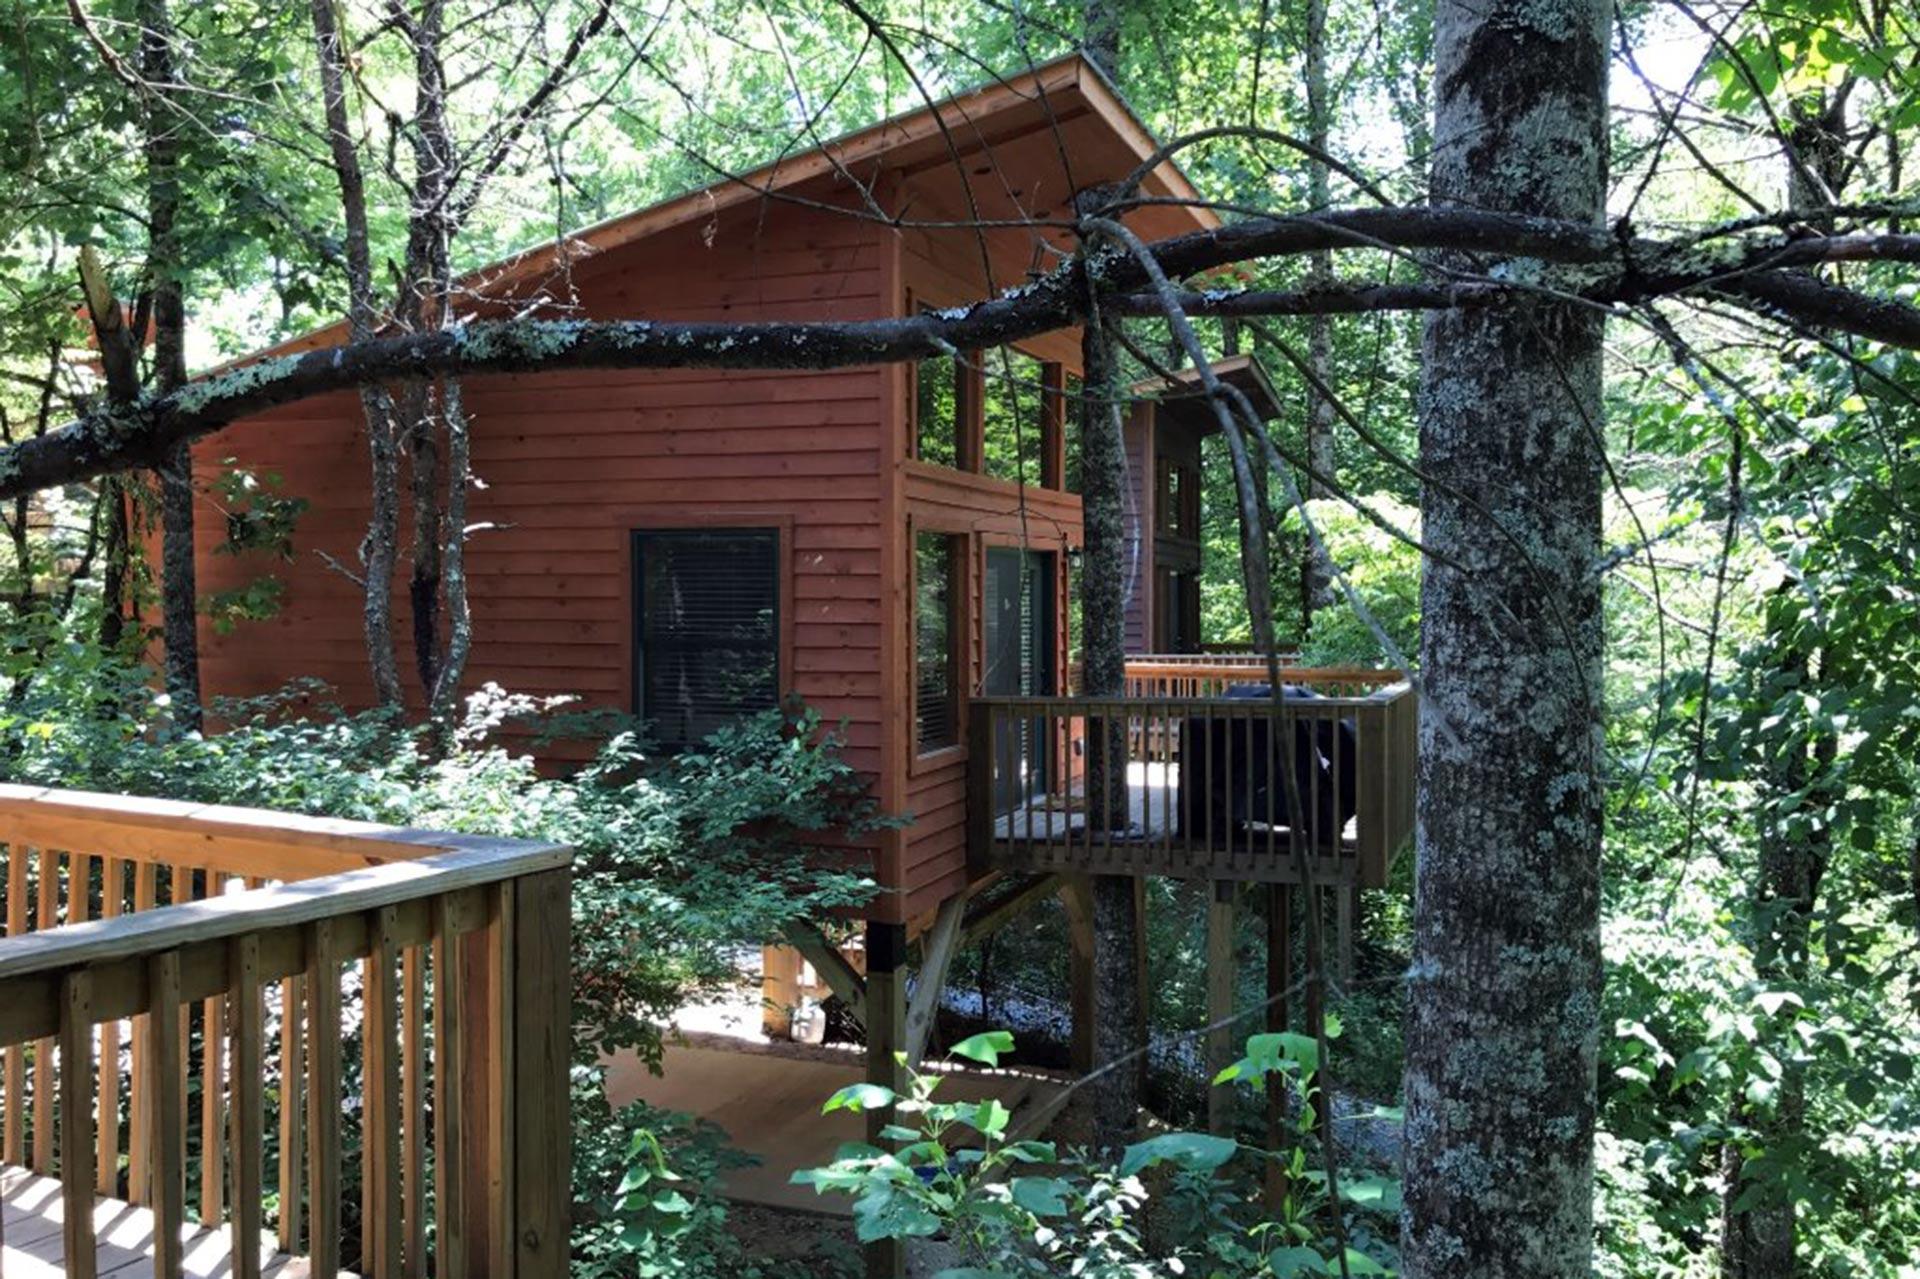 River's Edge Treehouse Resort in North Carolina